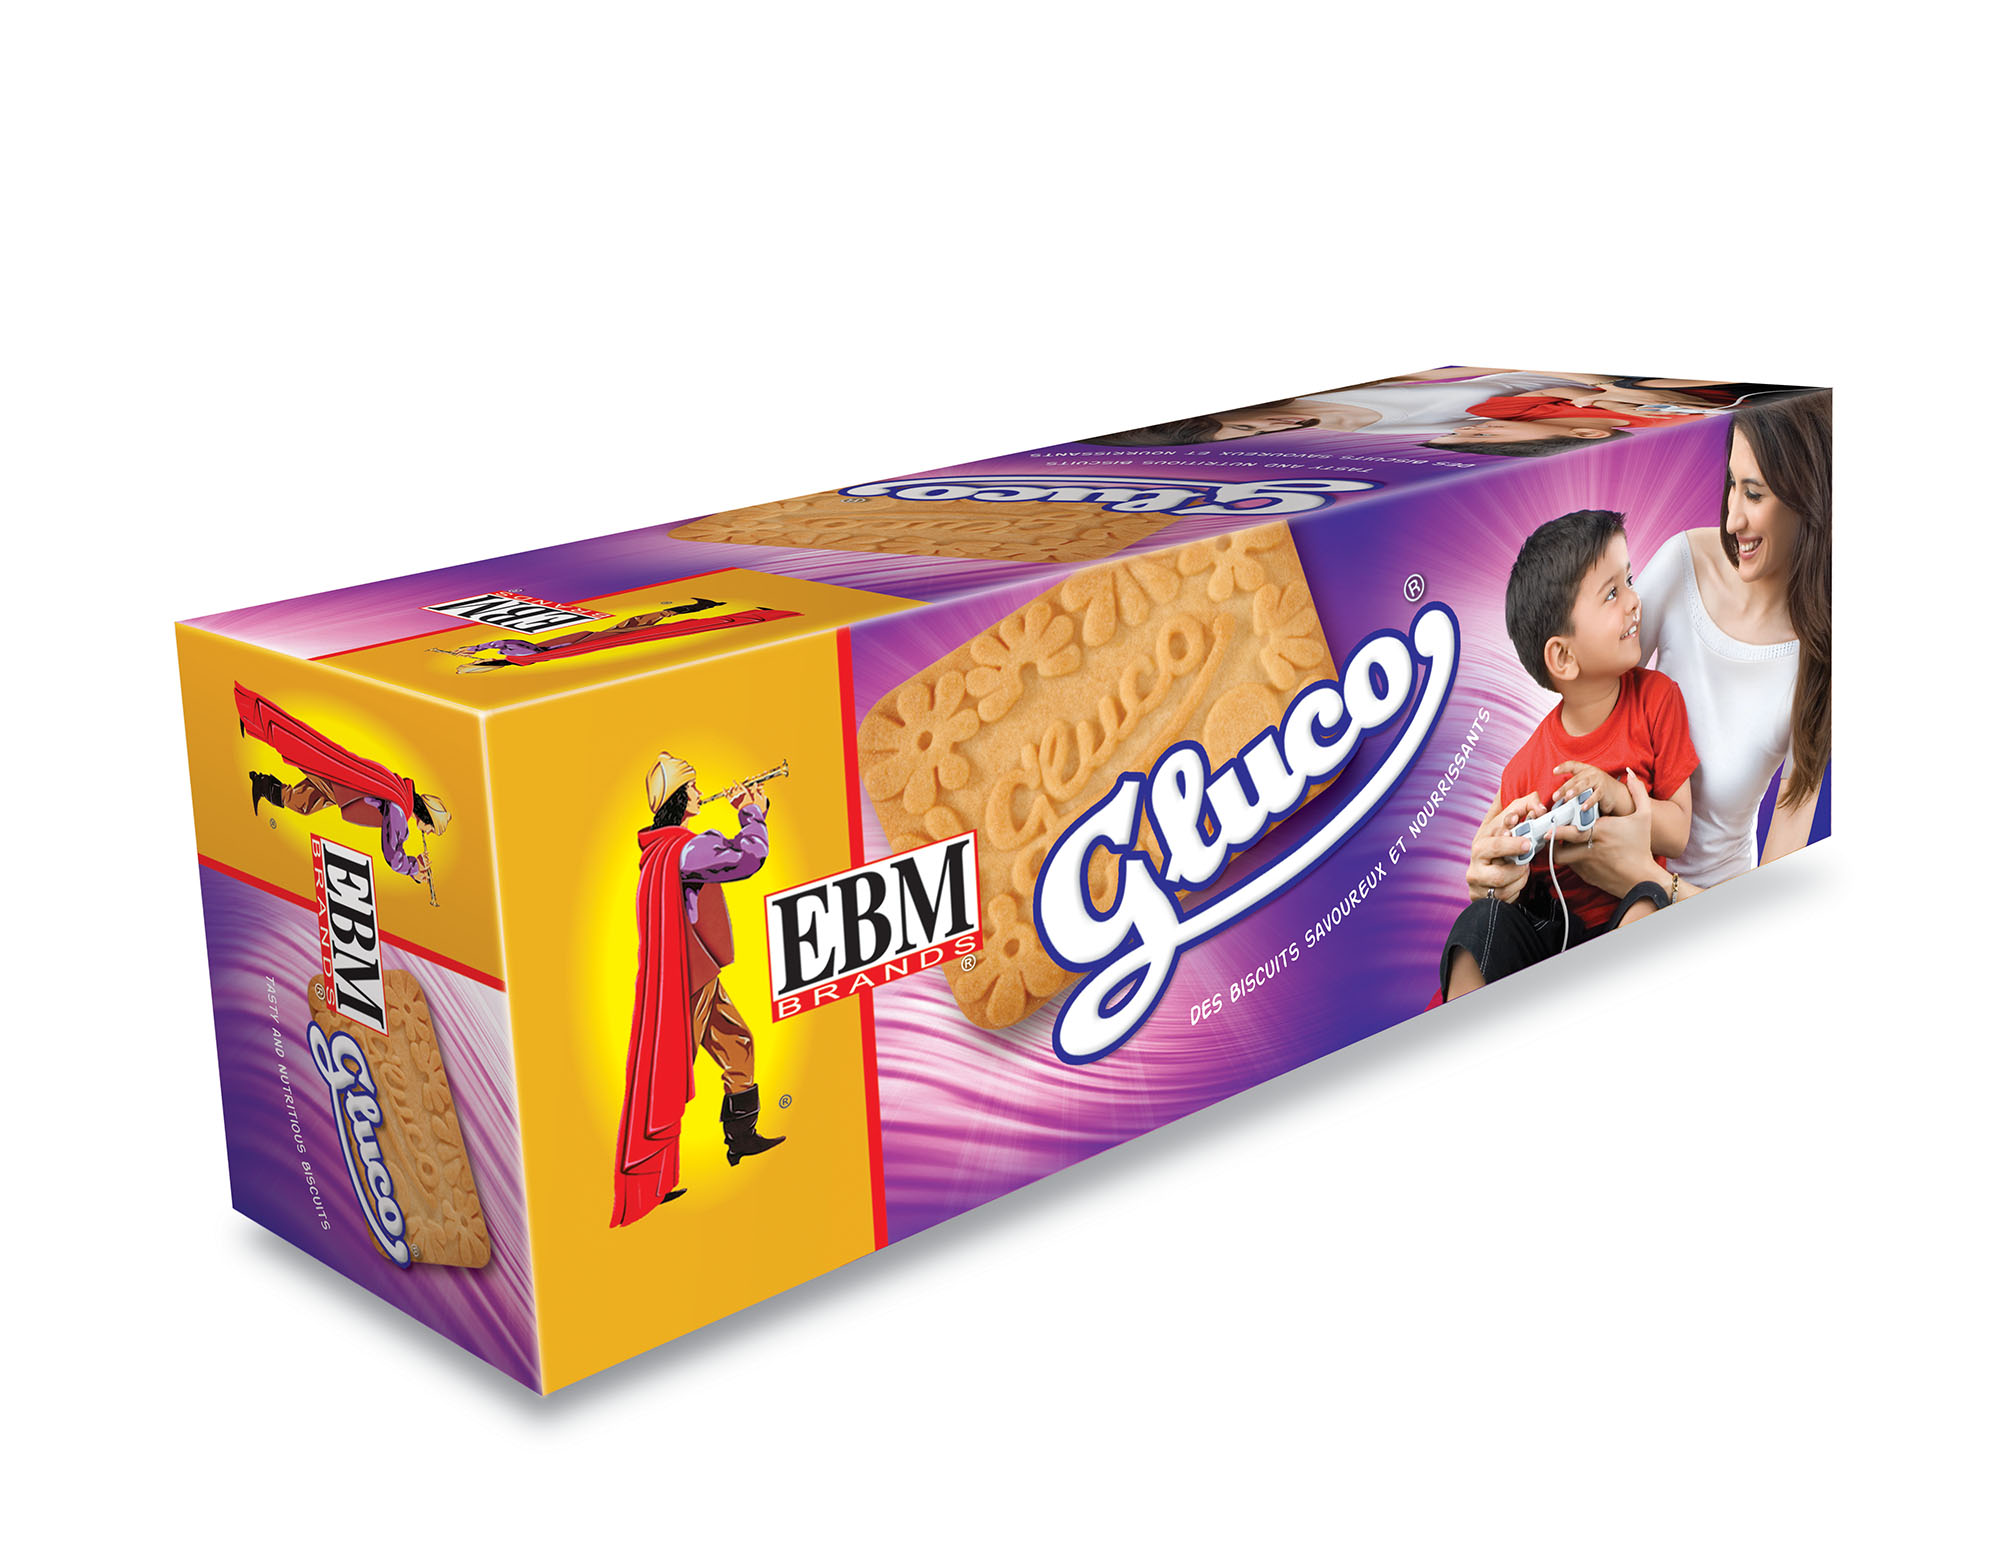 EBM Gluco Cookies